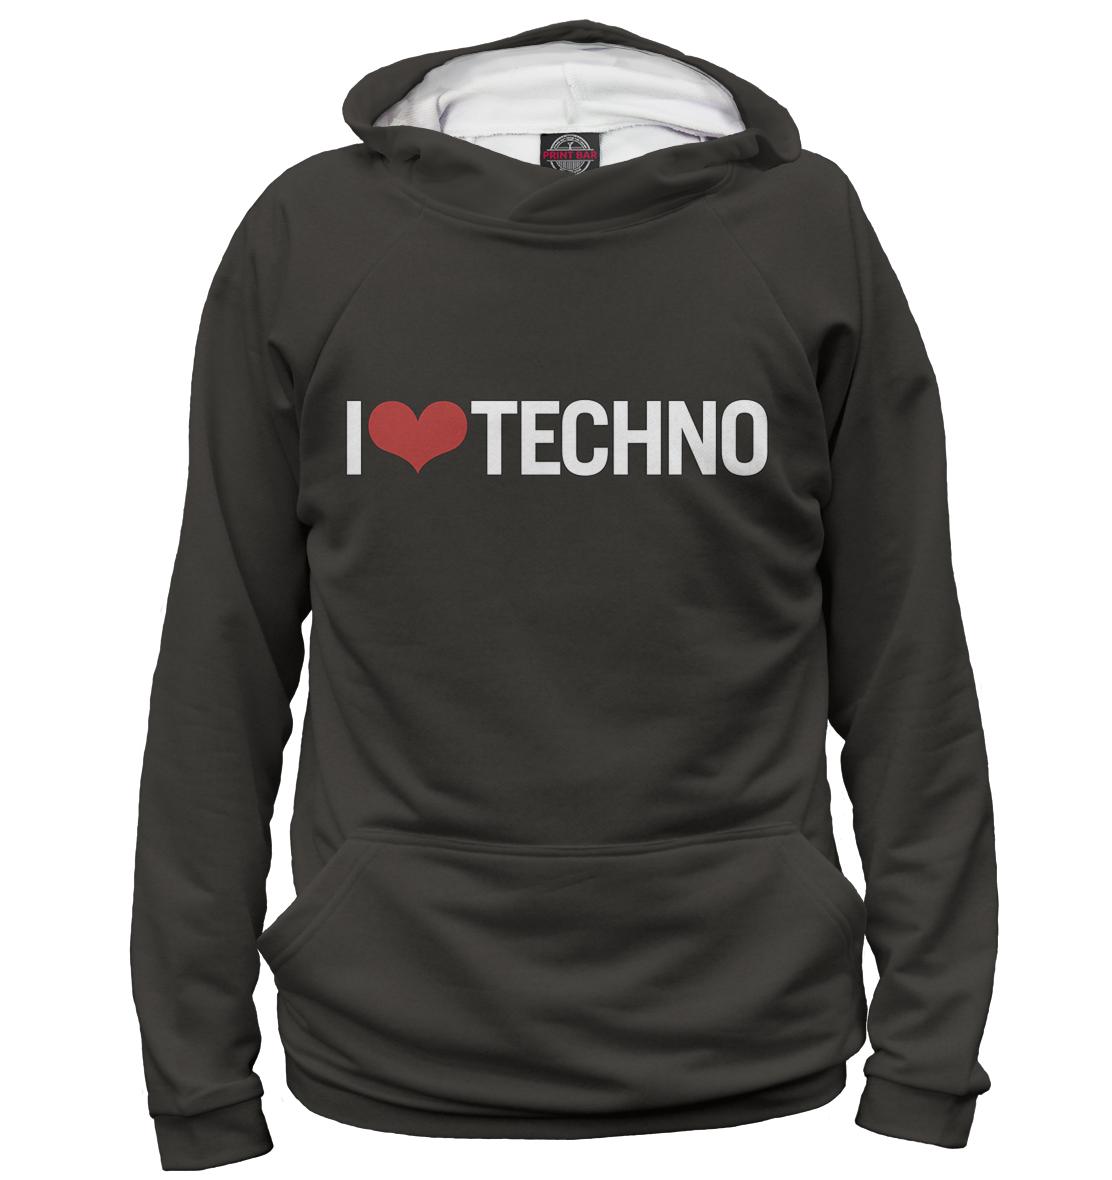 Купить I Love Techno, Printbar, Худи, TEC-750803-hud-1